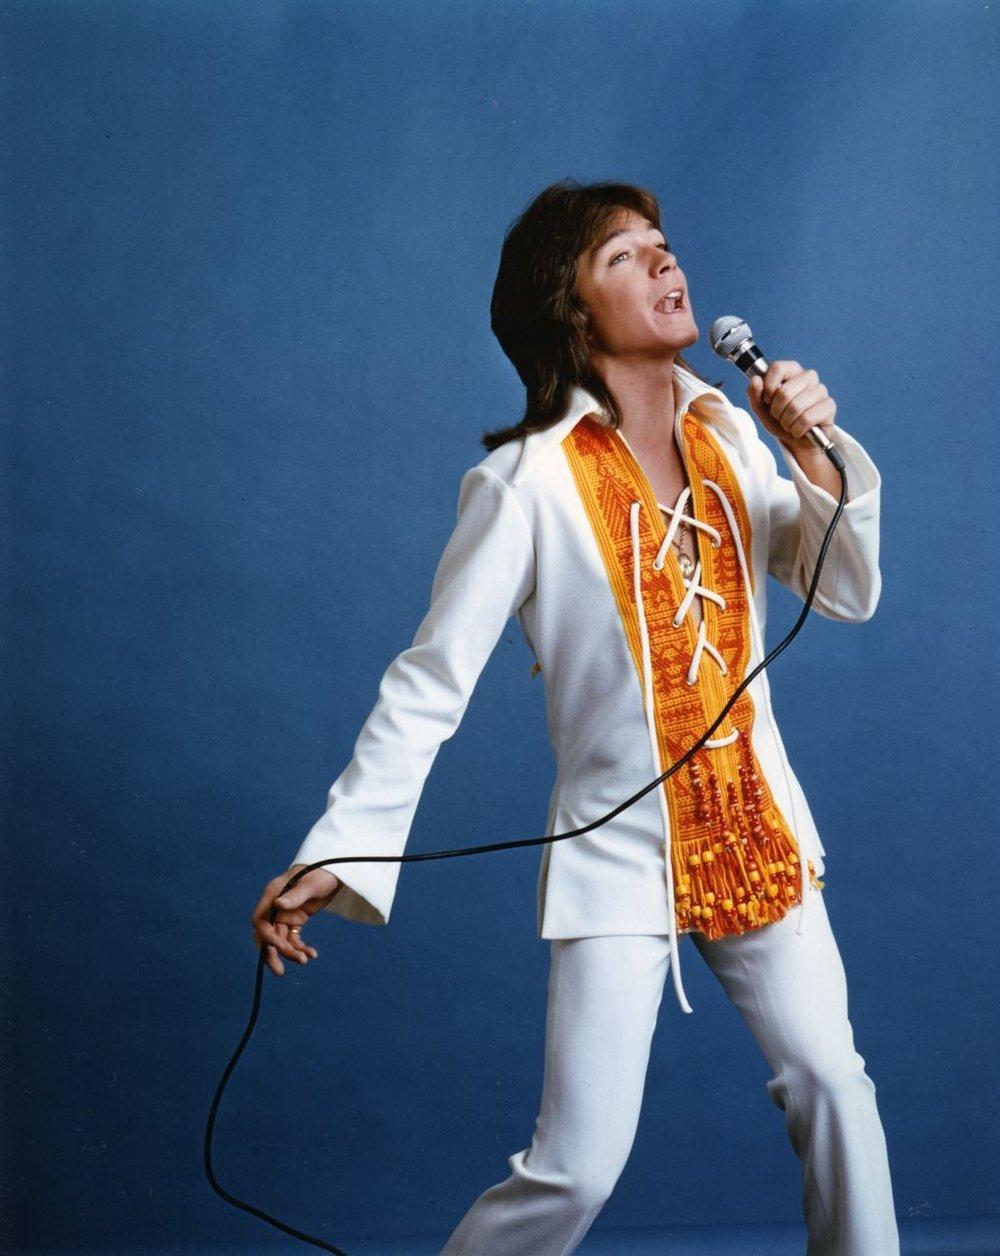 David 1971 concert pose.jpg